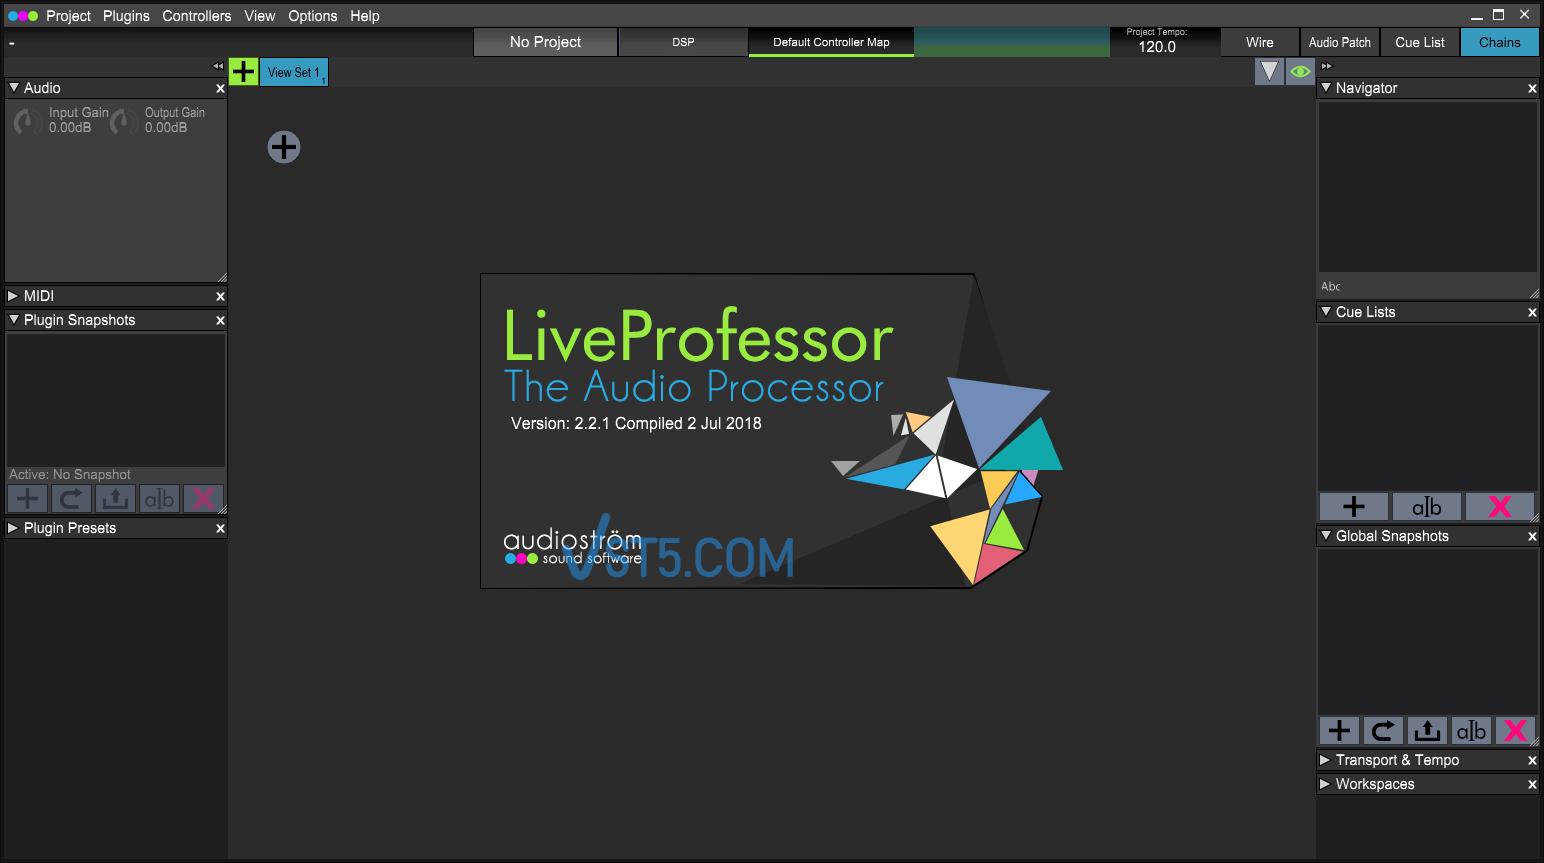 LiveProfessor 2 V2.2.1绿色免安装版 含32/64位 解压后可直接使用插图